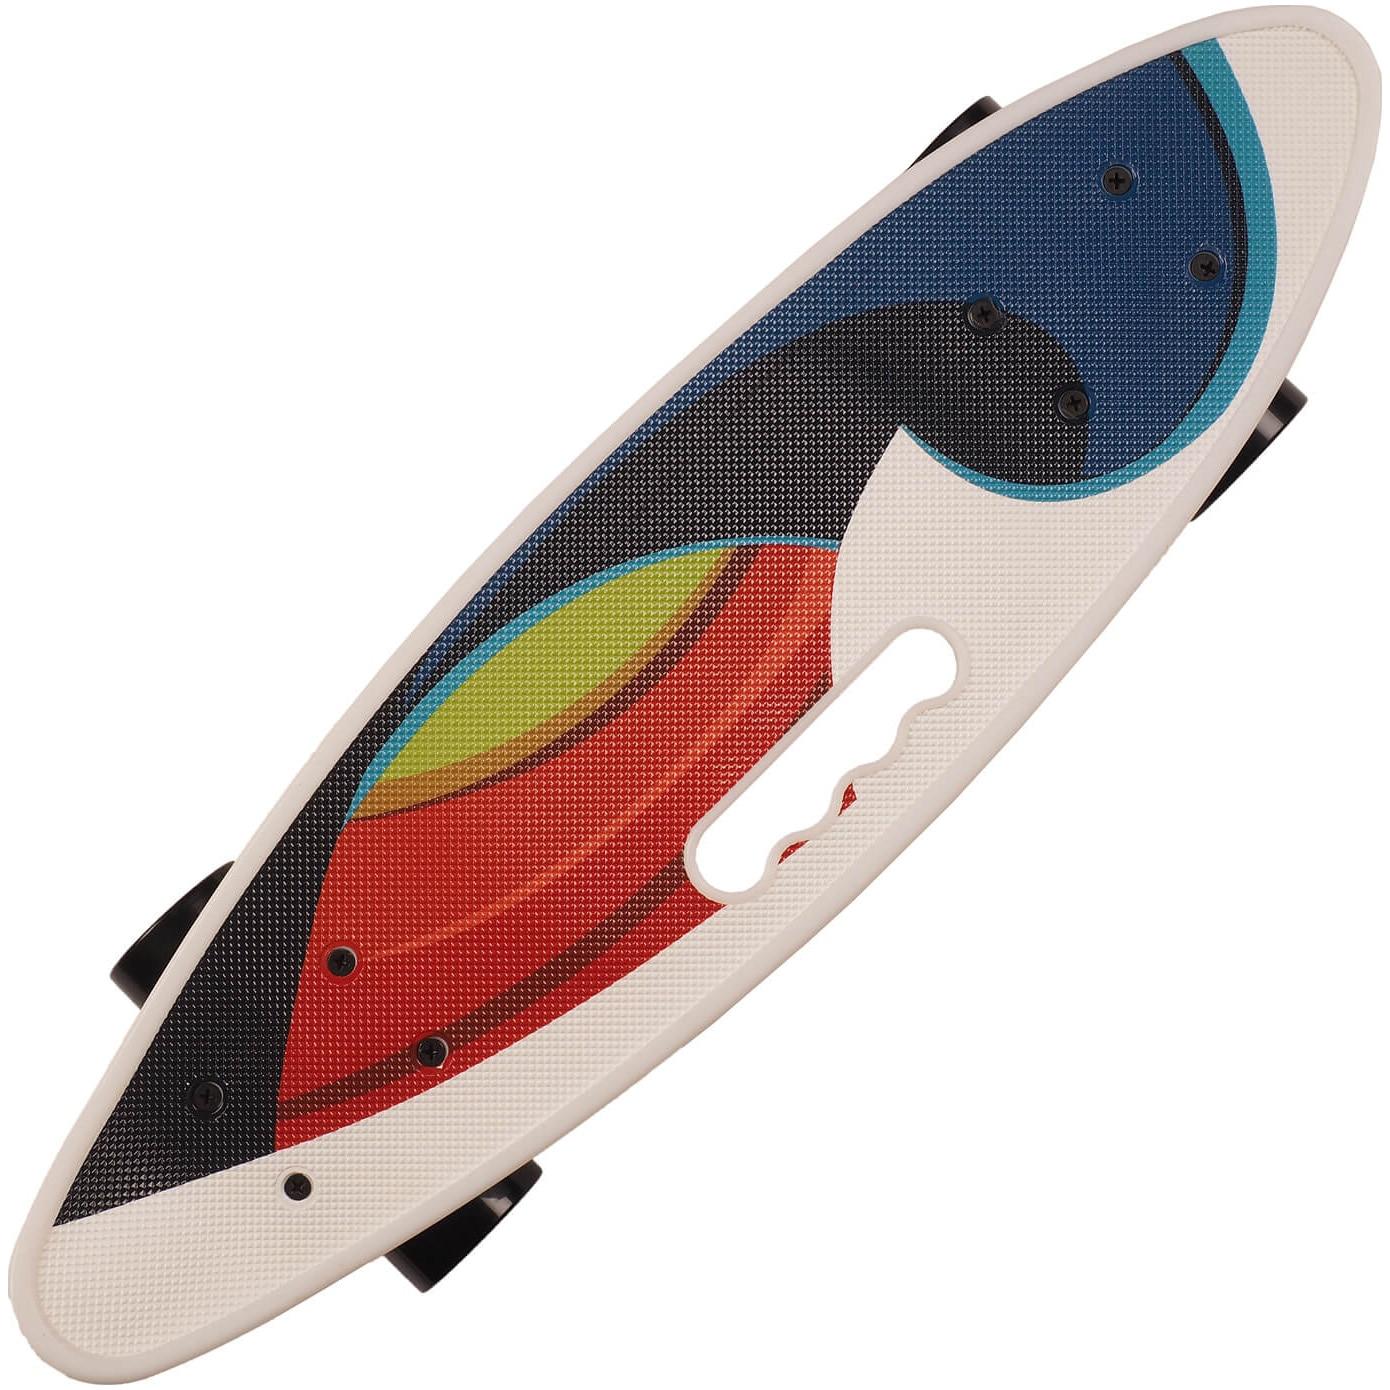 Fotografie Penny board Action One® Portabil ABEC-7, PU, Aluminiu, Color Wave